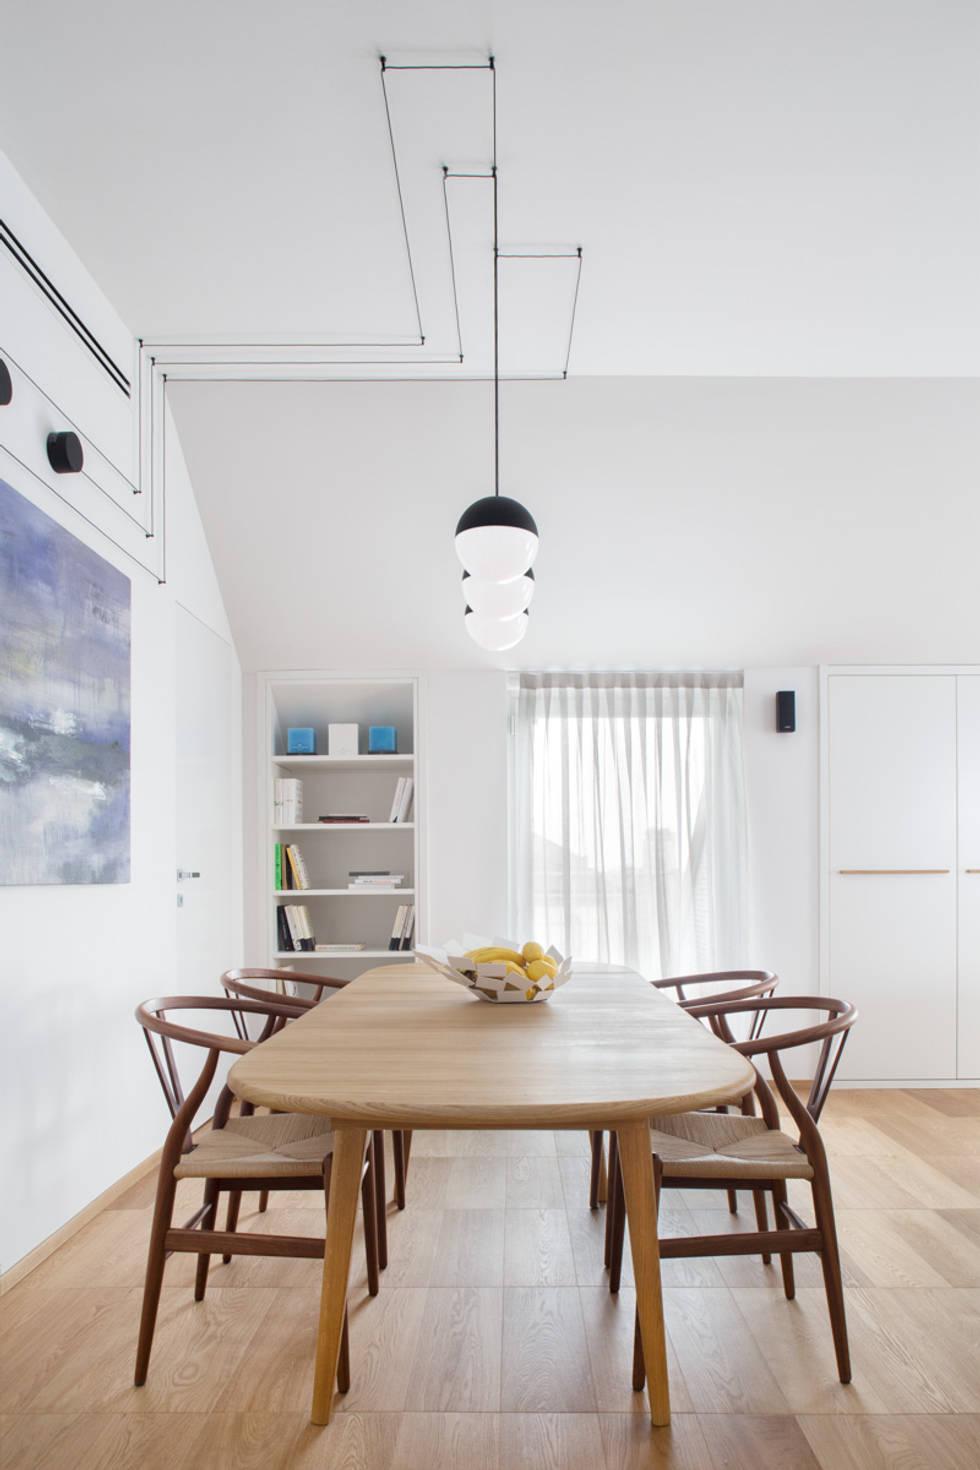 Un Appartamento Moderno Sconvolgente (Milano)